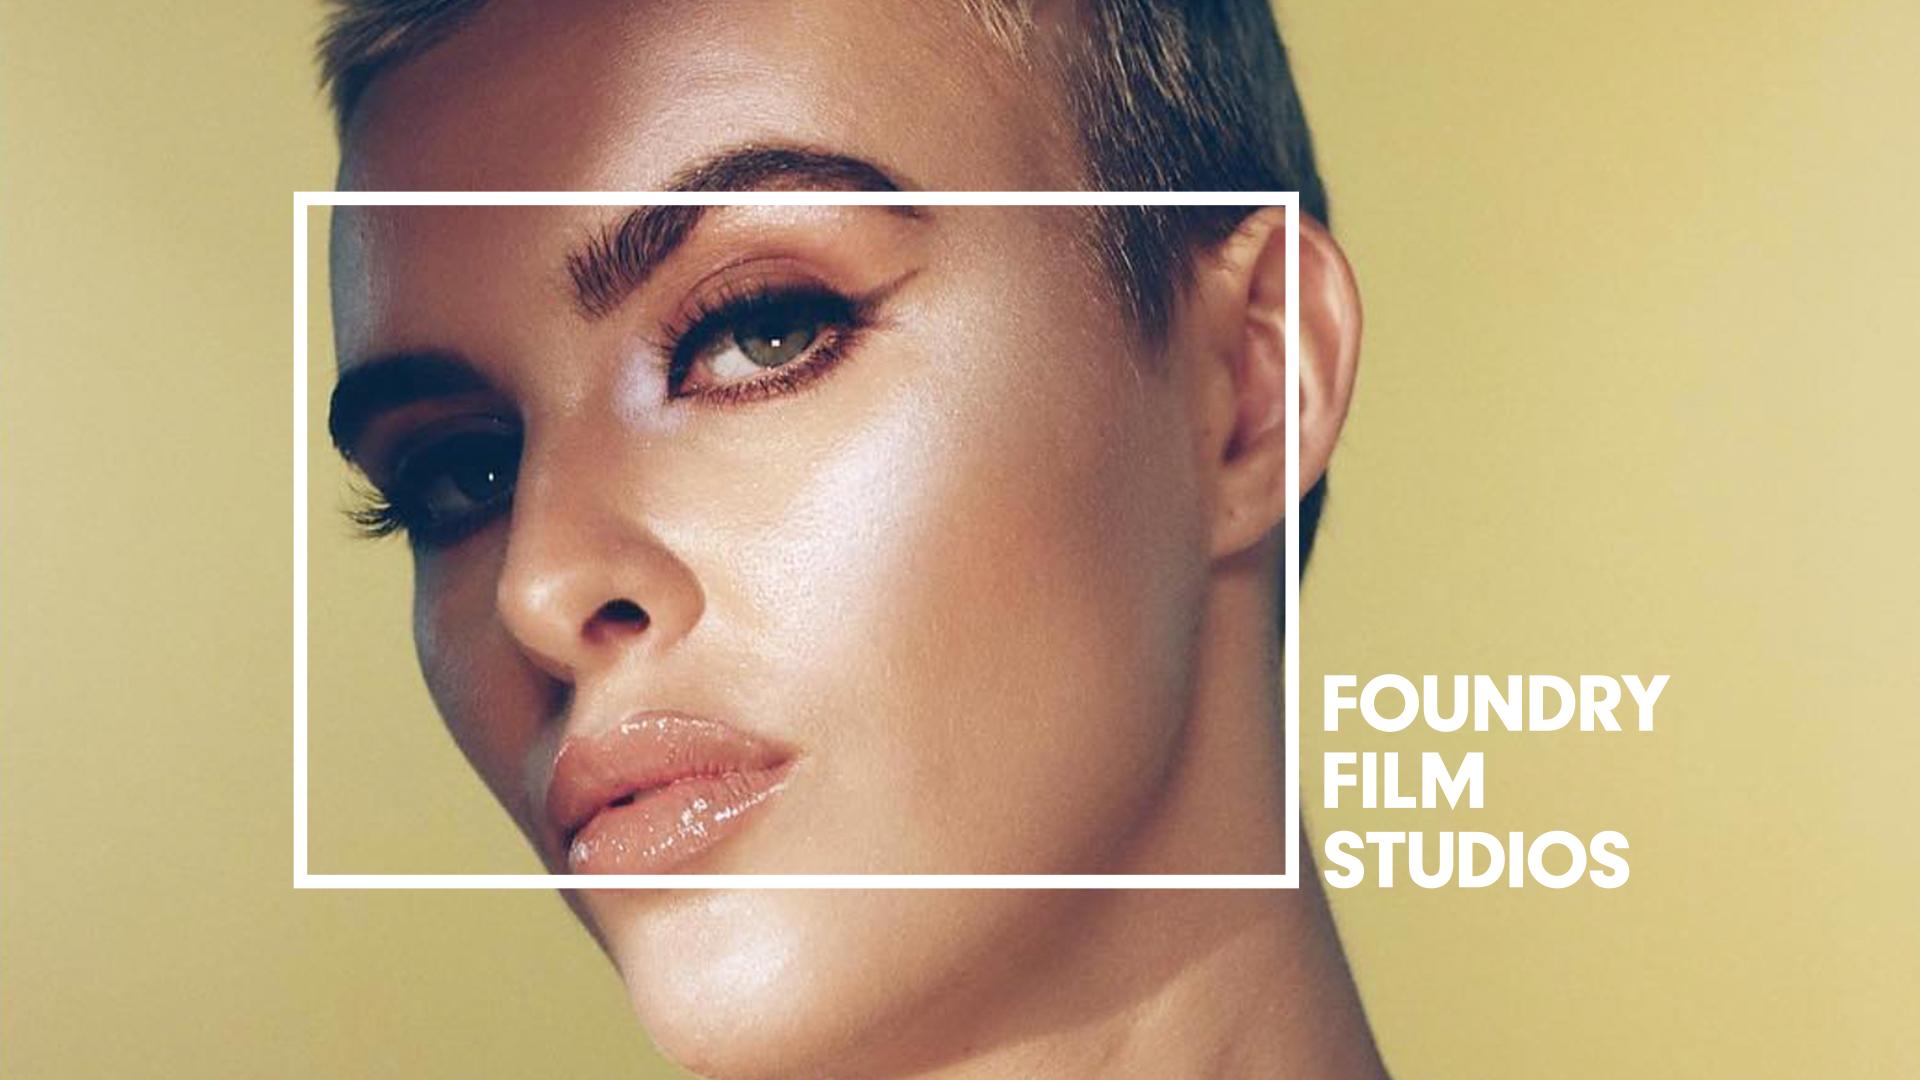 FoundryFilmStudios-WhiteLogoThumbs01